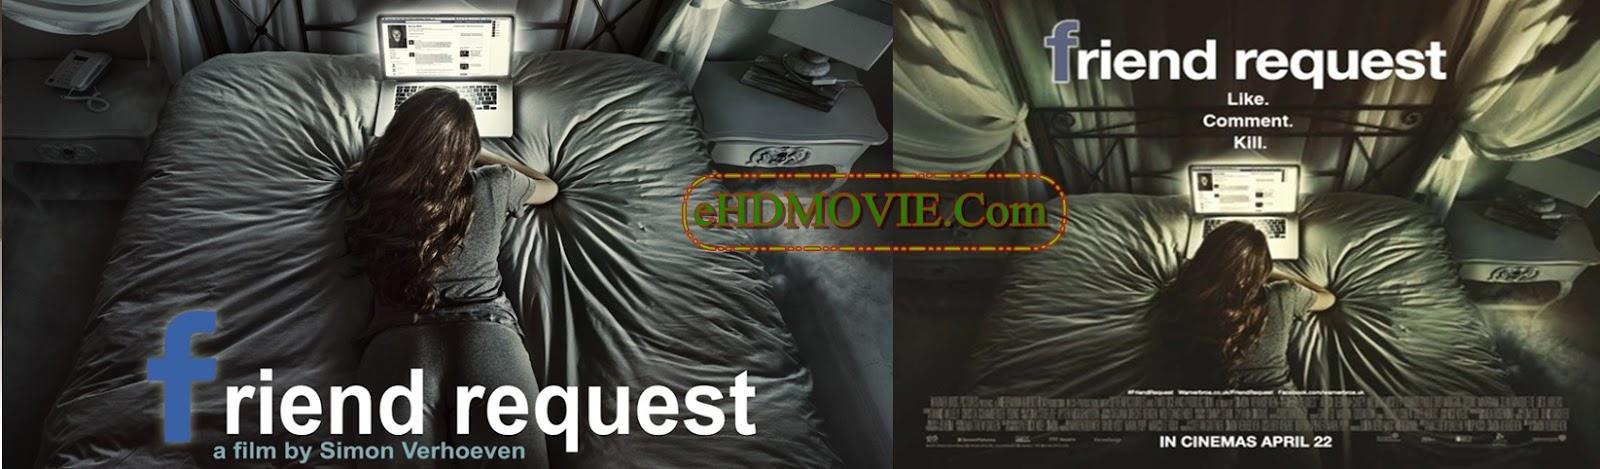 Friend Request 2016 Full Movie Dual Audio [Hindi – English] 720p - 480p ORG BRRip 300MB - 700MB ESubs Free Download